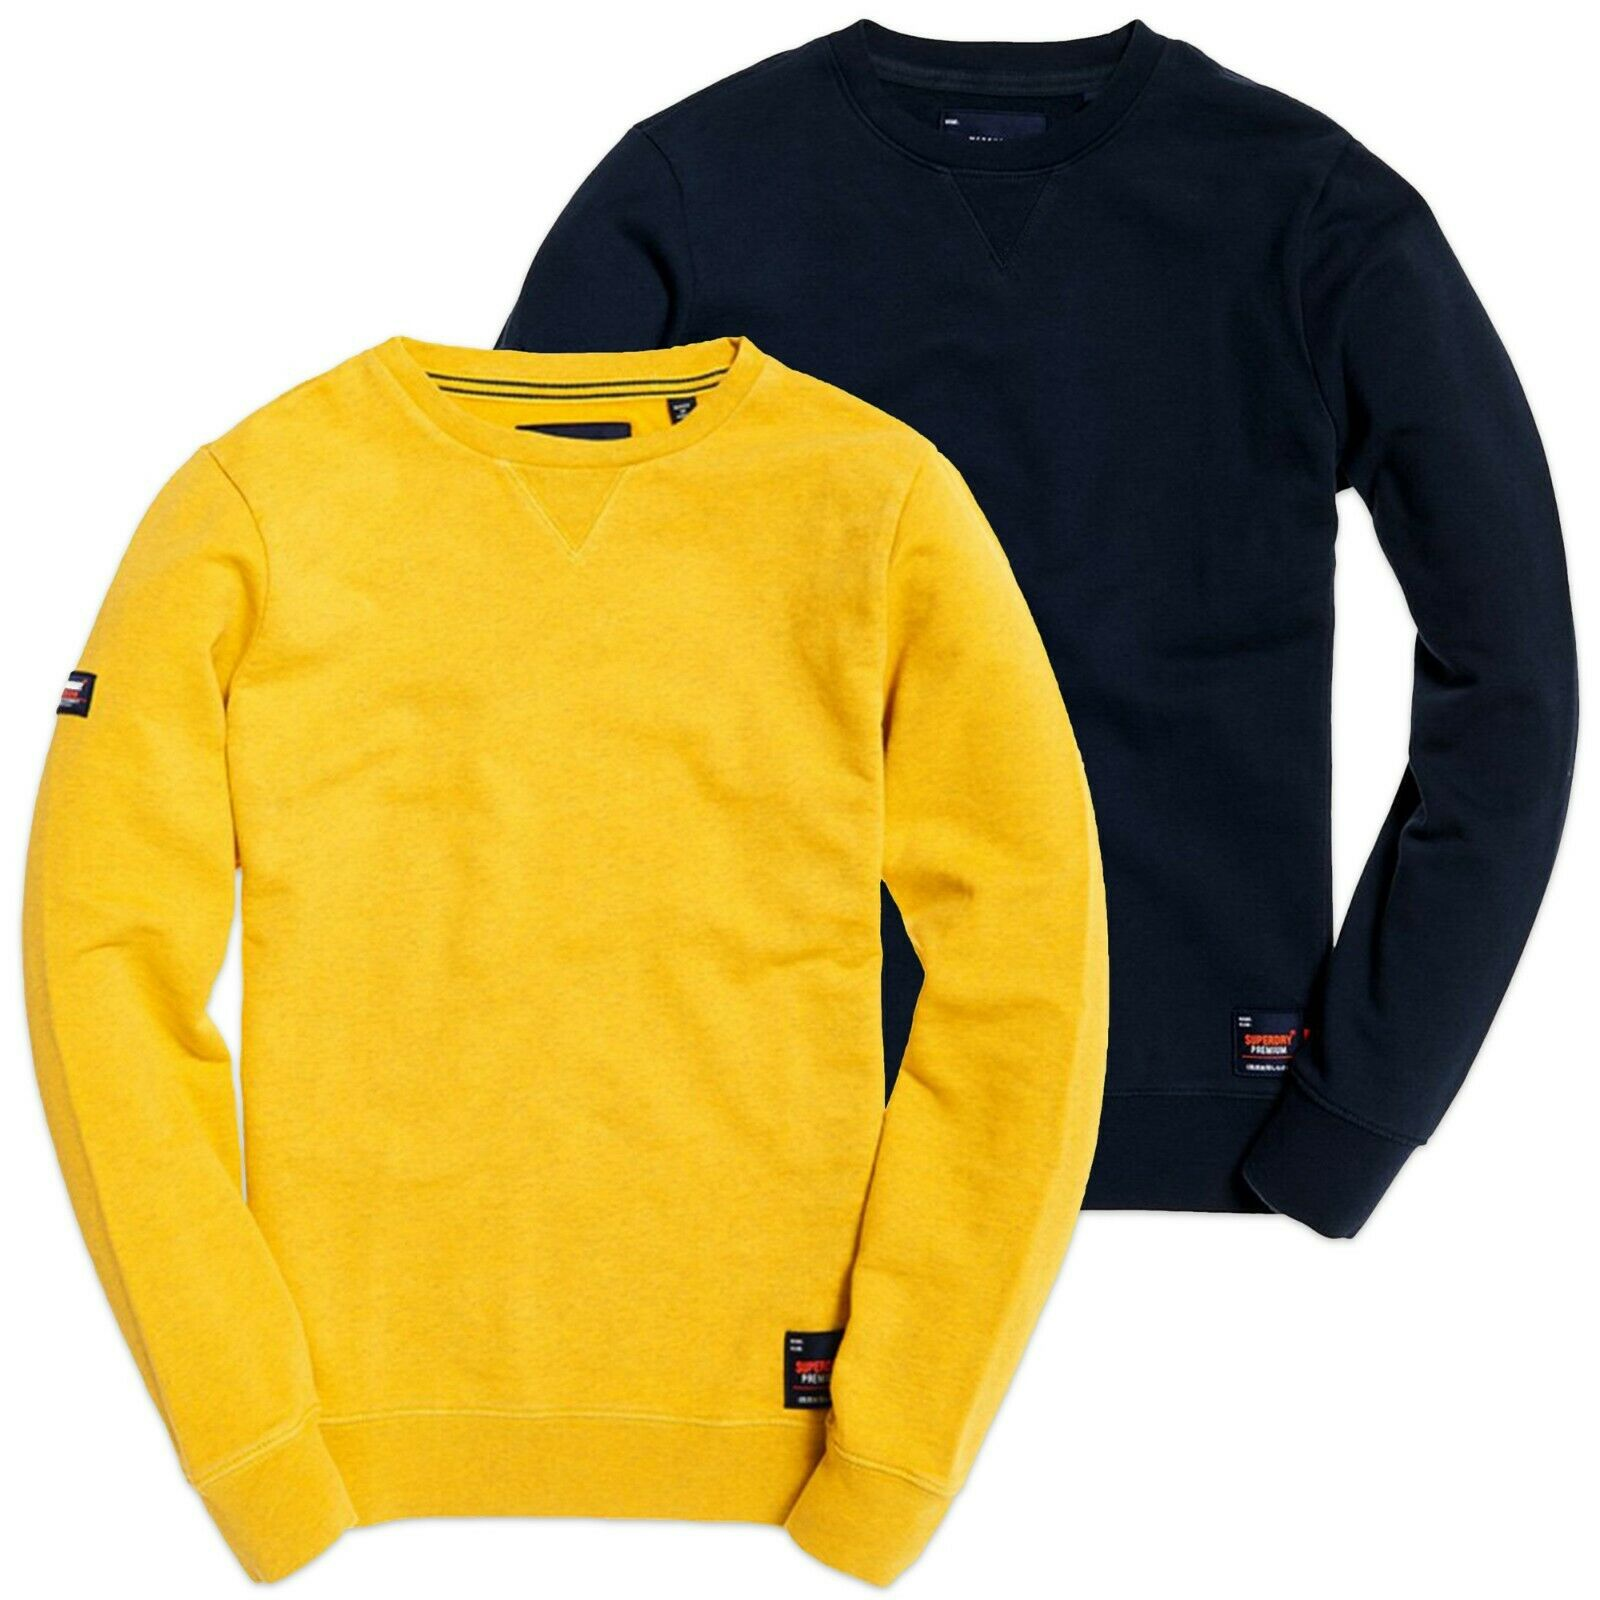 Superdry Sweatshirt - Superdry Dry Originals Crew Sweat - Navy, Yellow - BNWT